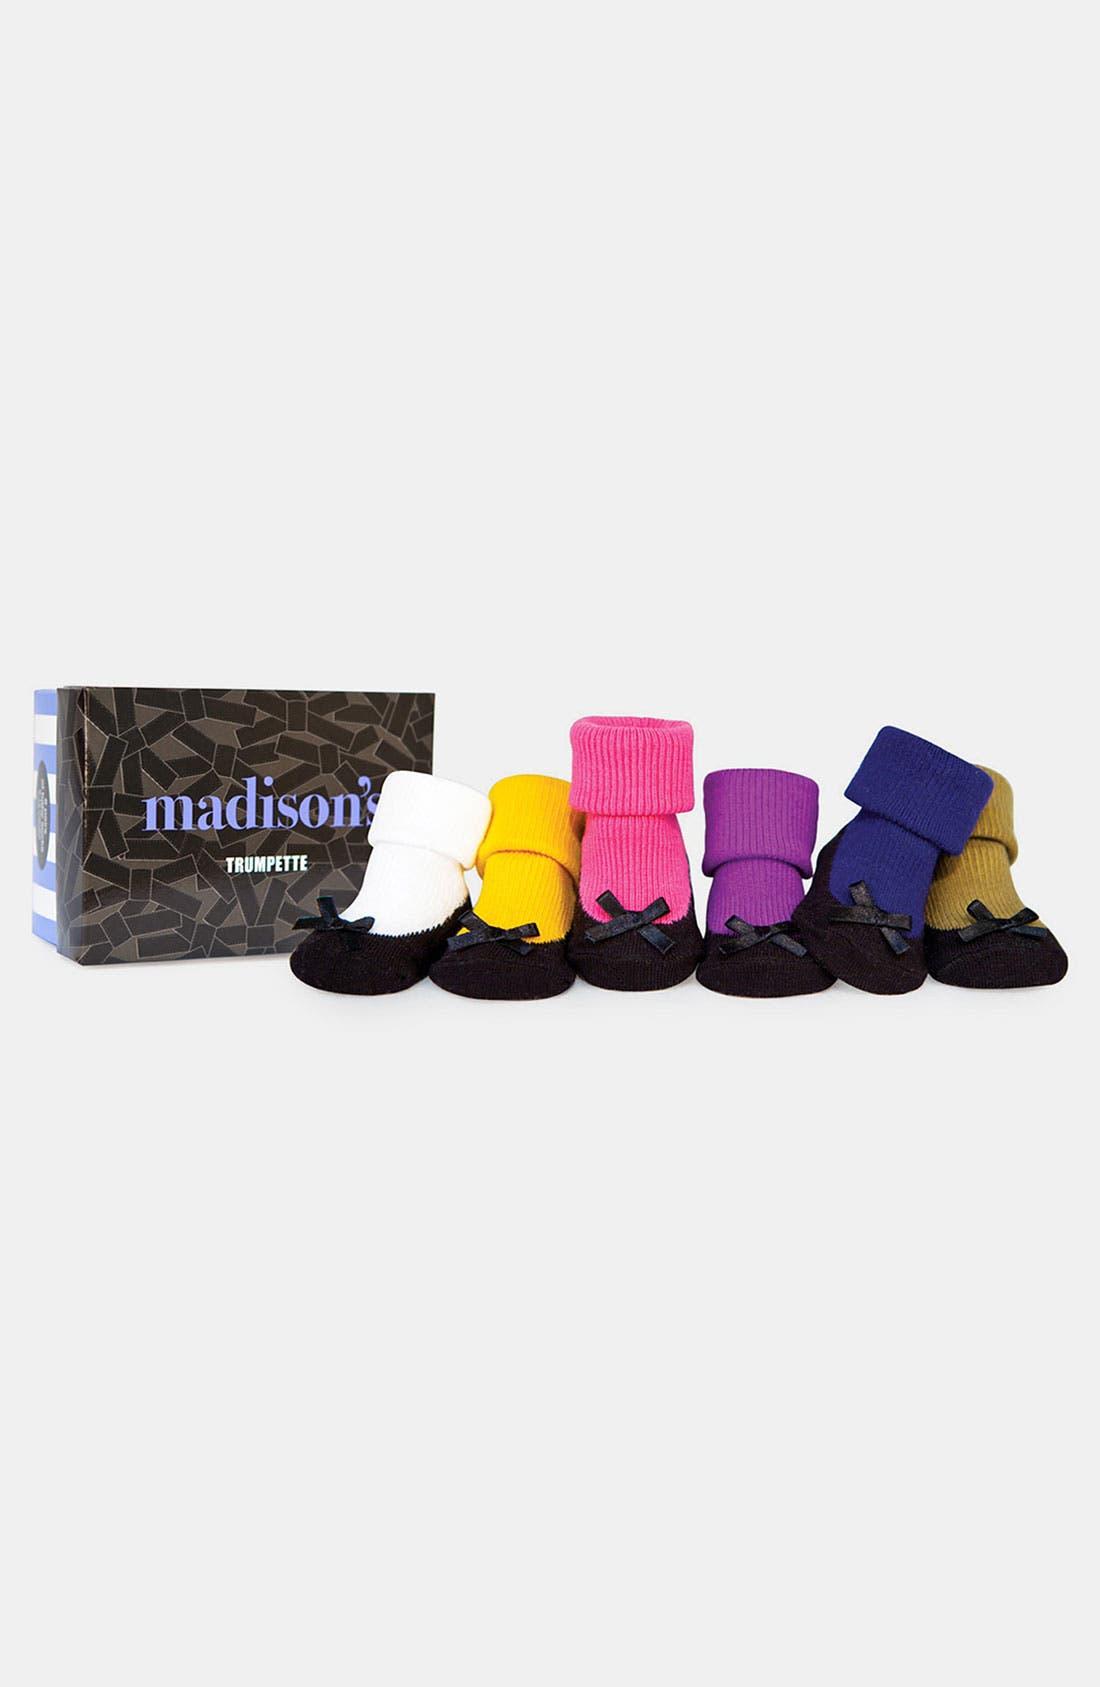 Main Image - Trumpette 'Madison's' Socks (6-Pack)(Baby Girls)